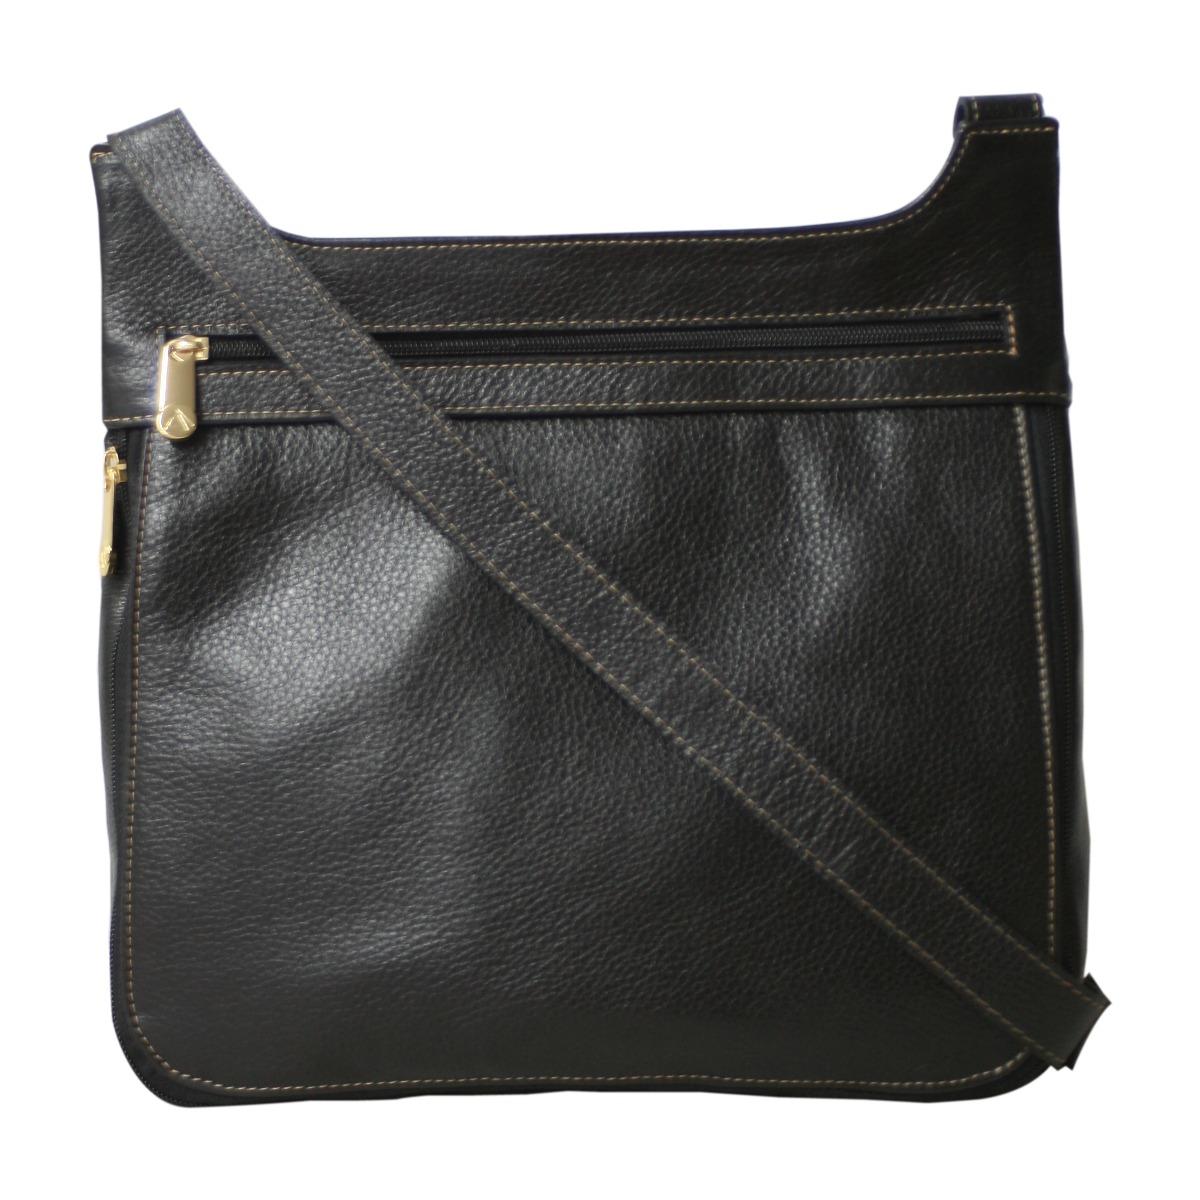 7d0691ea04 bolsa de couro legítimo transversal segura preta allegra. Carregando zoom.